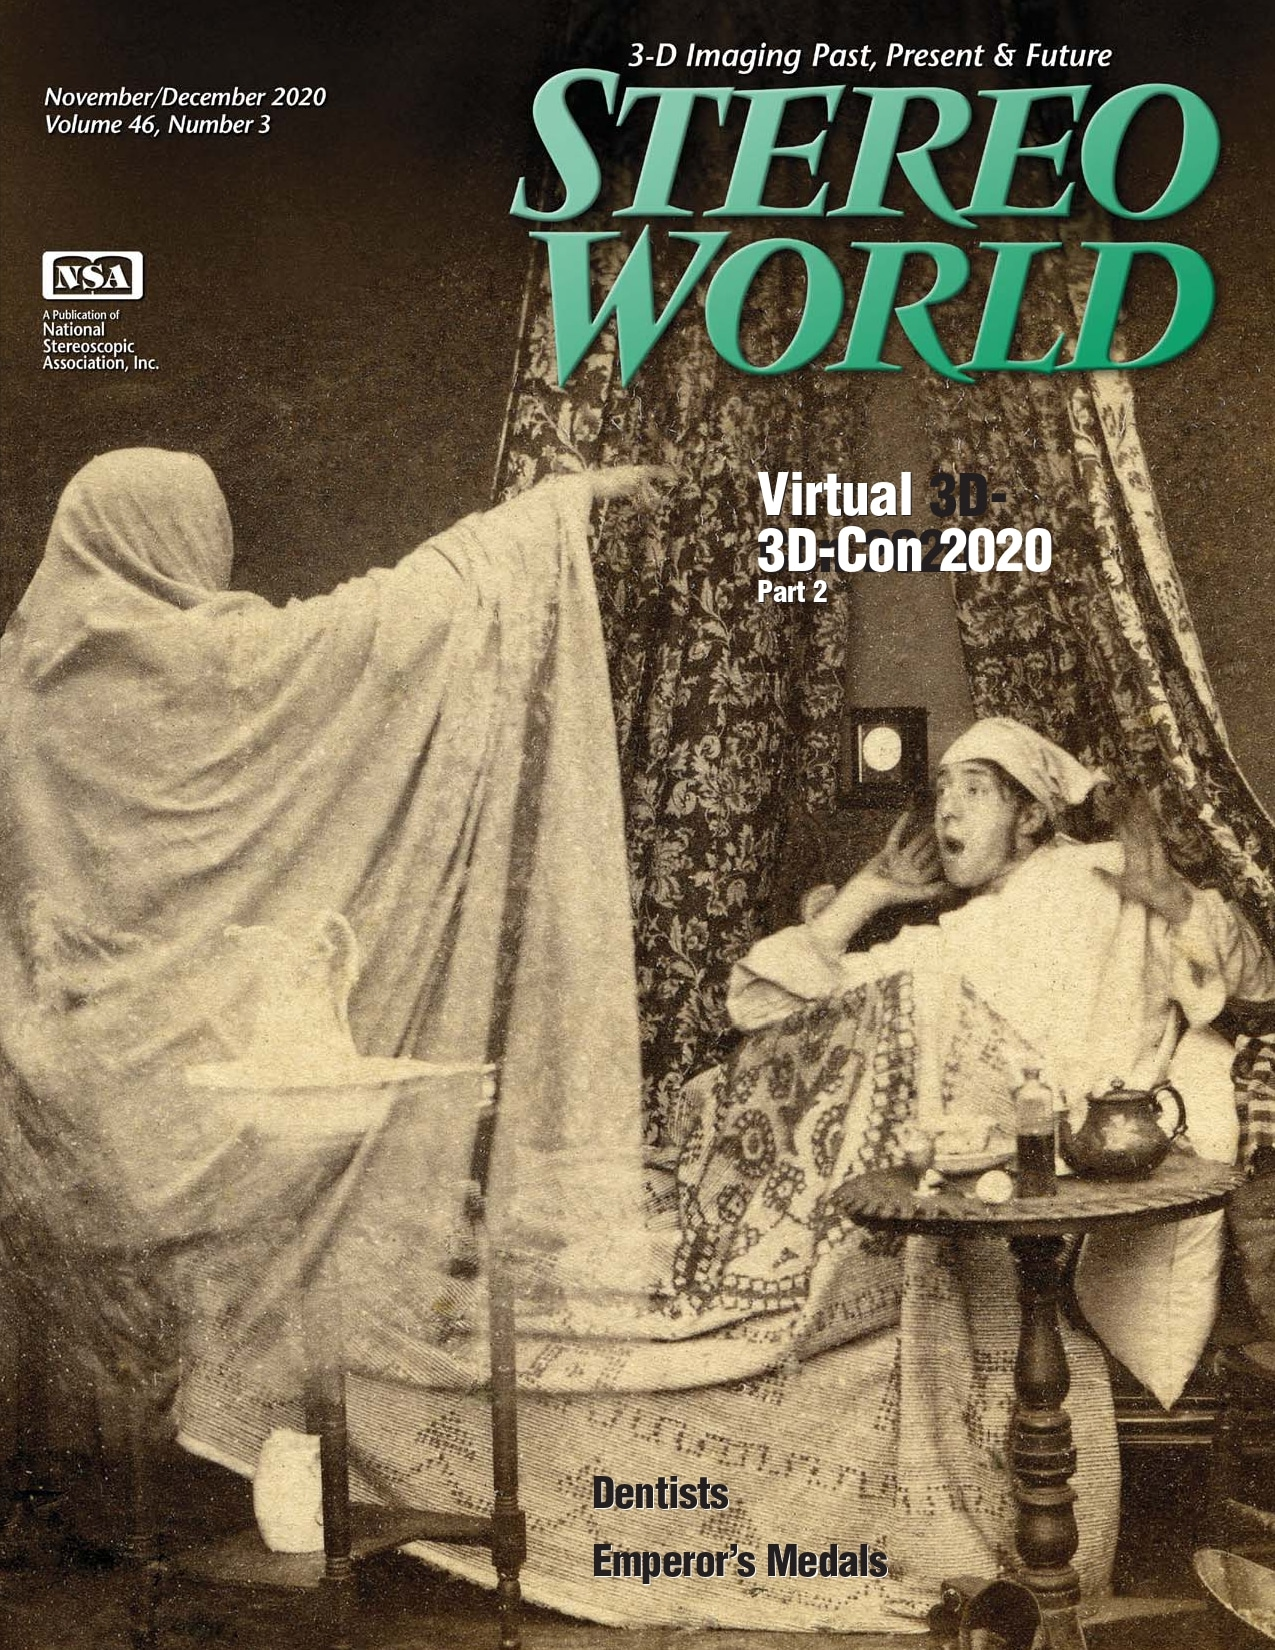 Stereo World magazine cover image Vol 46 issue 3 Nov Dec 2020